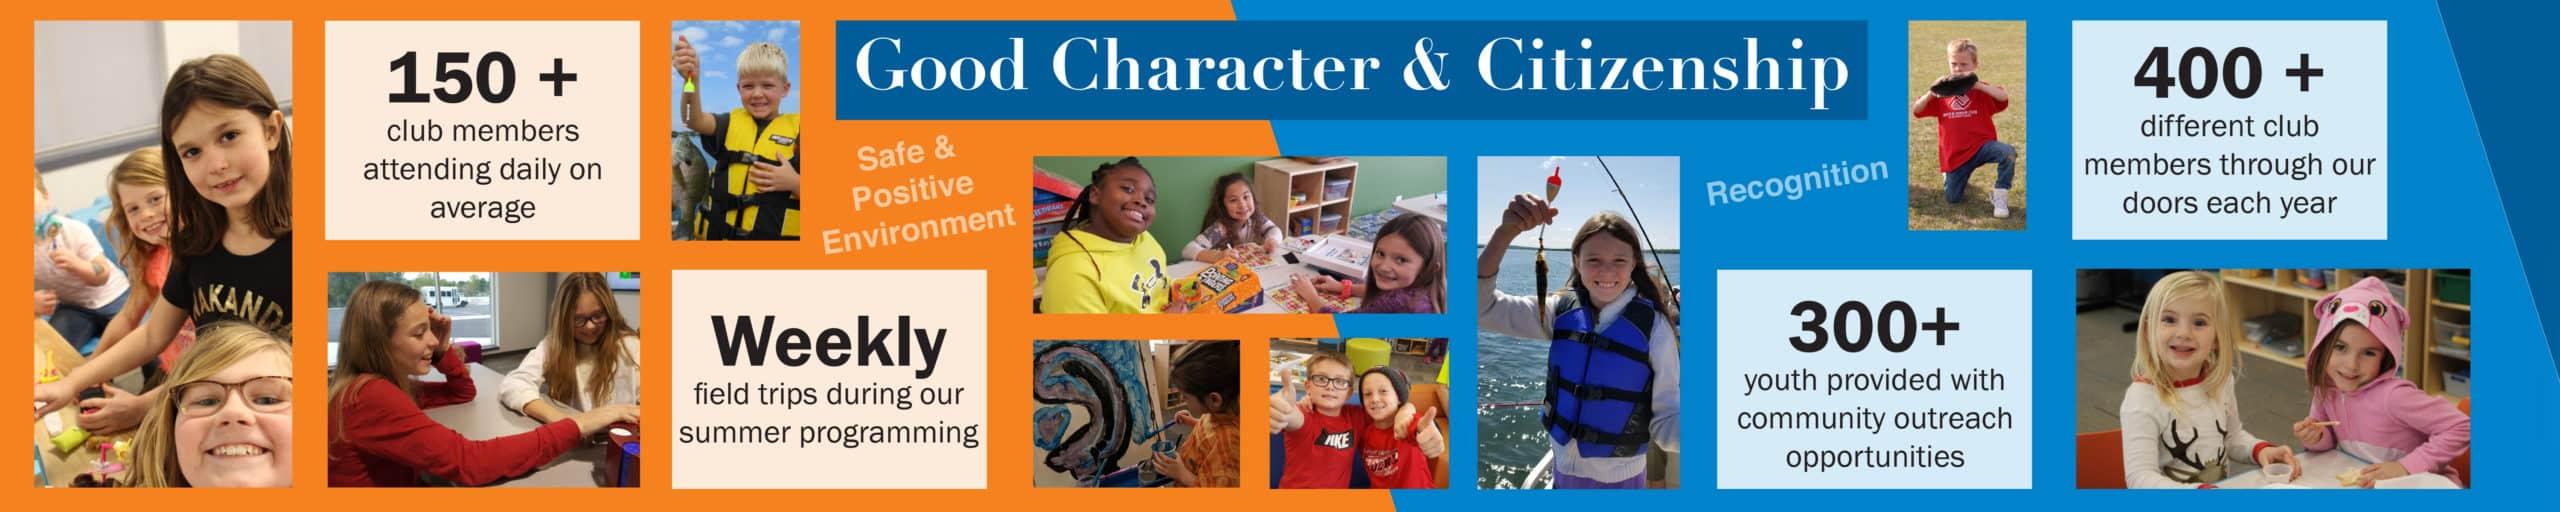 Boy & Girls Club enables good character & citizenship